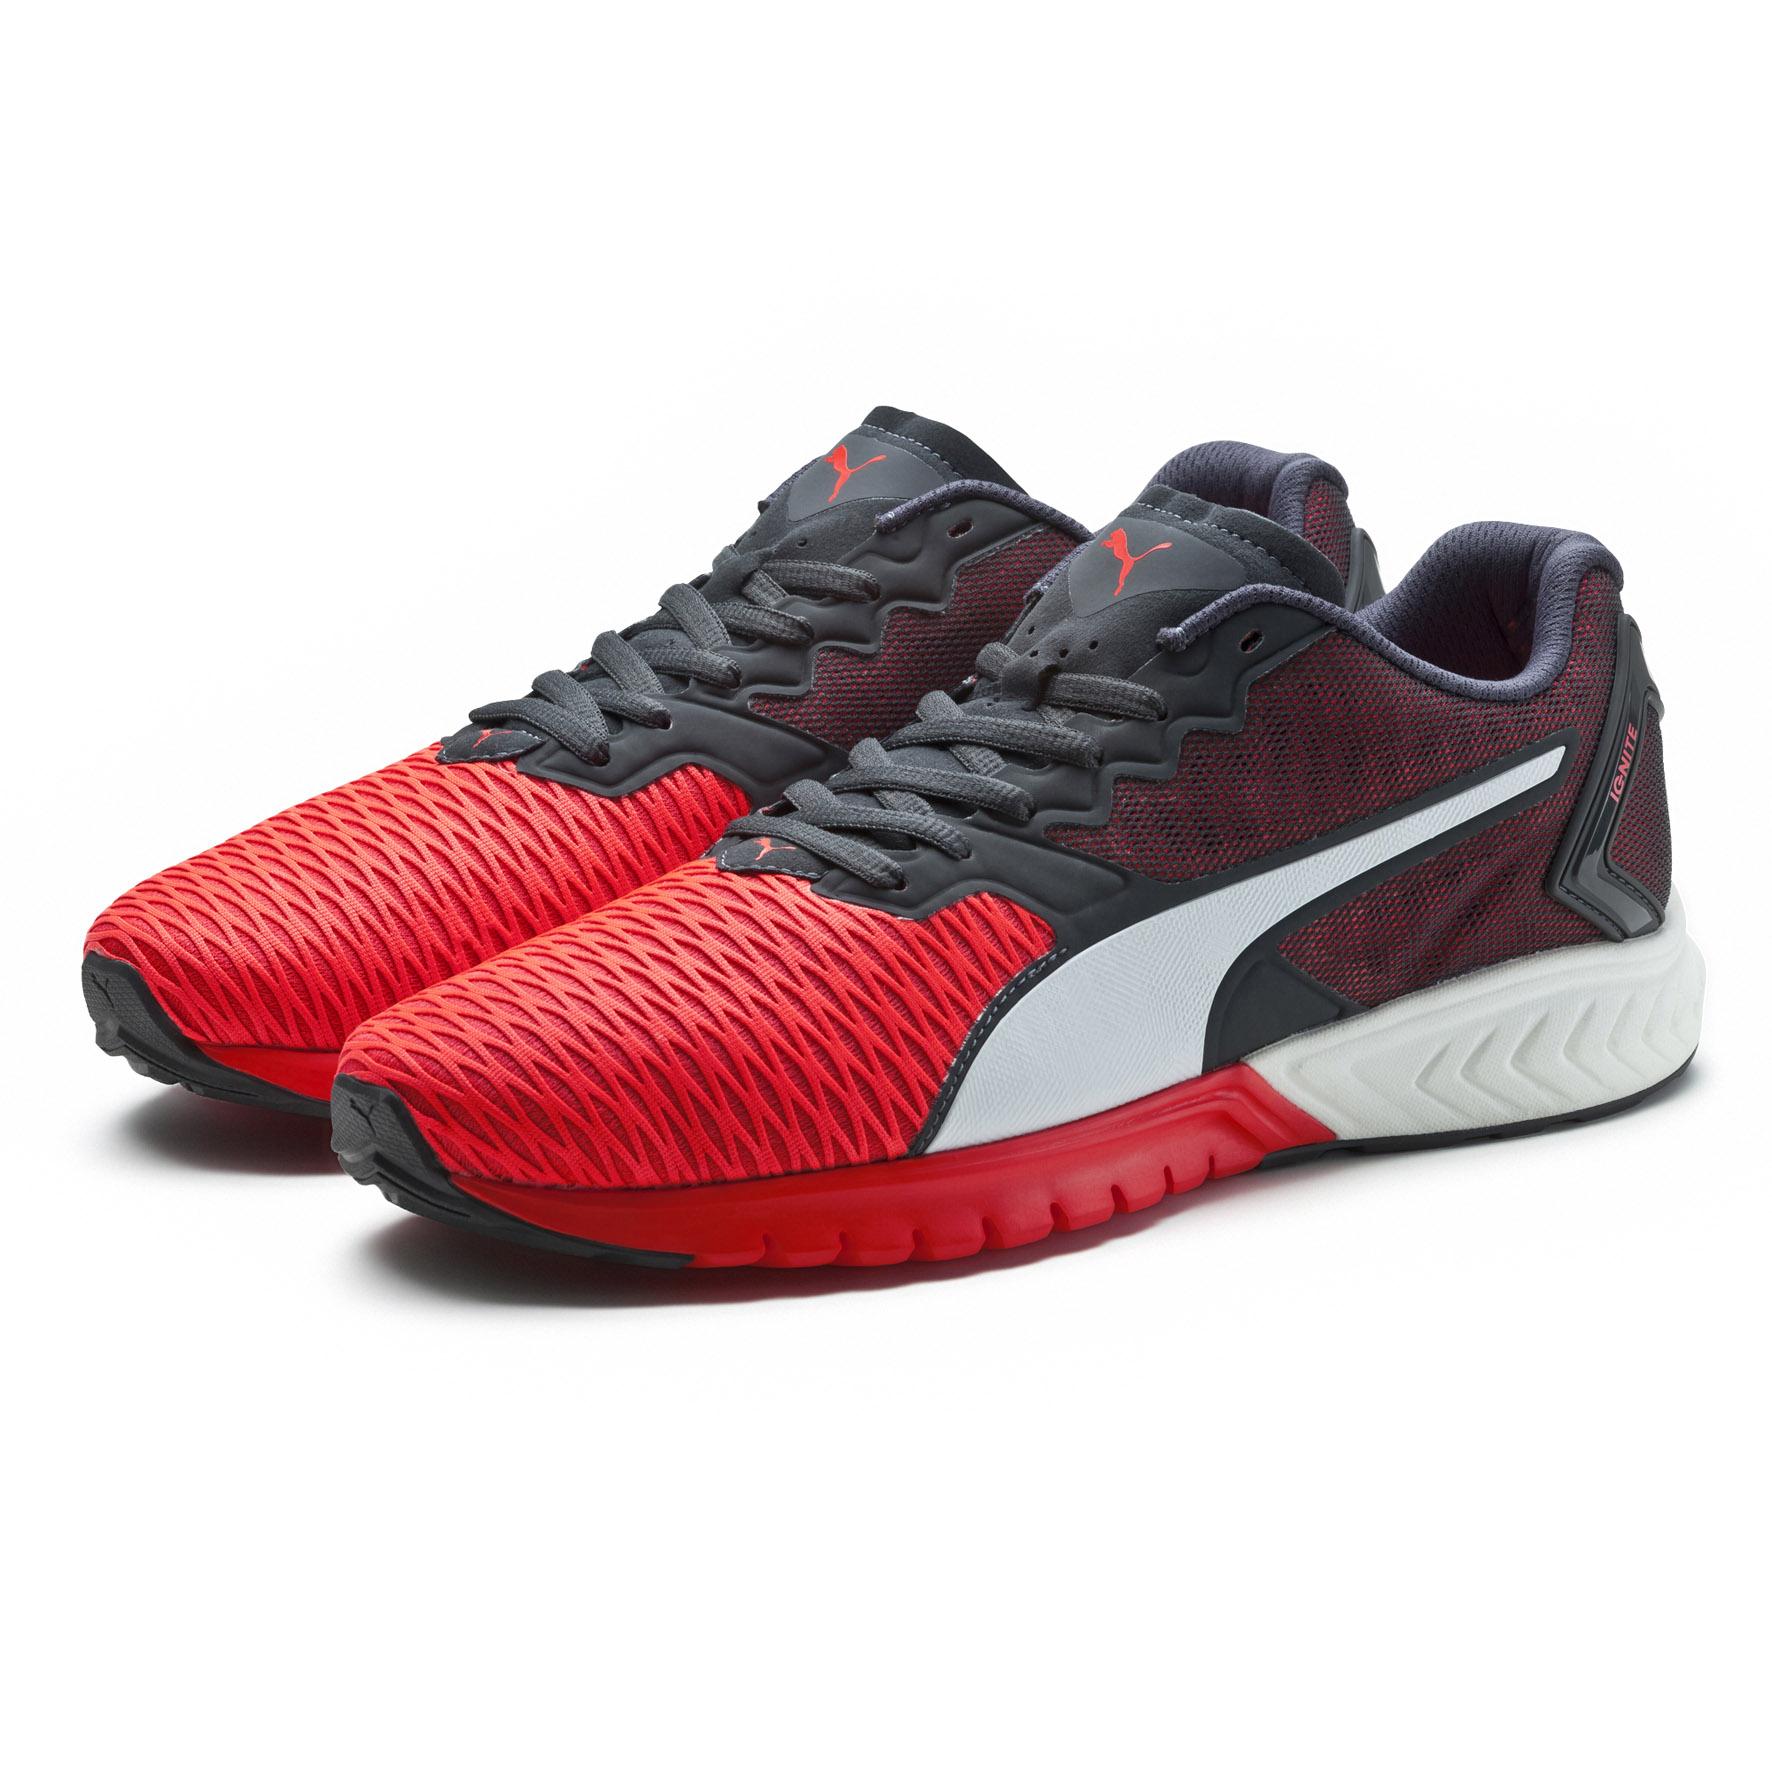 Puma Shoes Toes